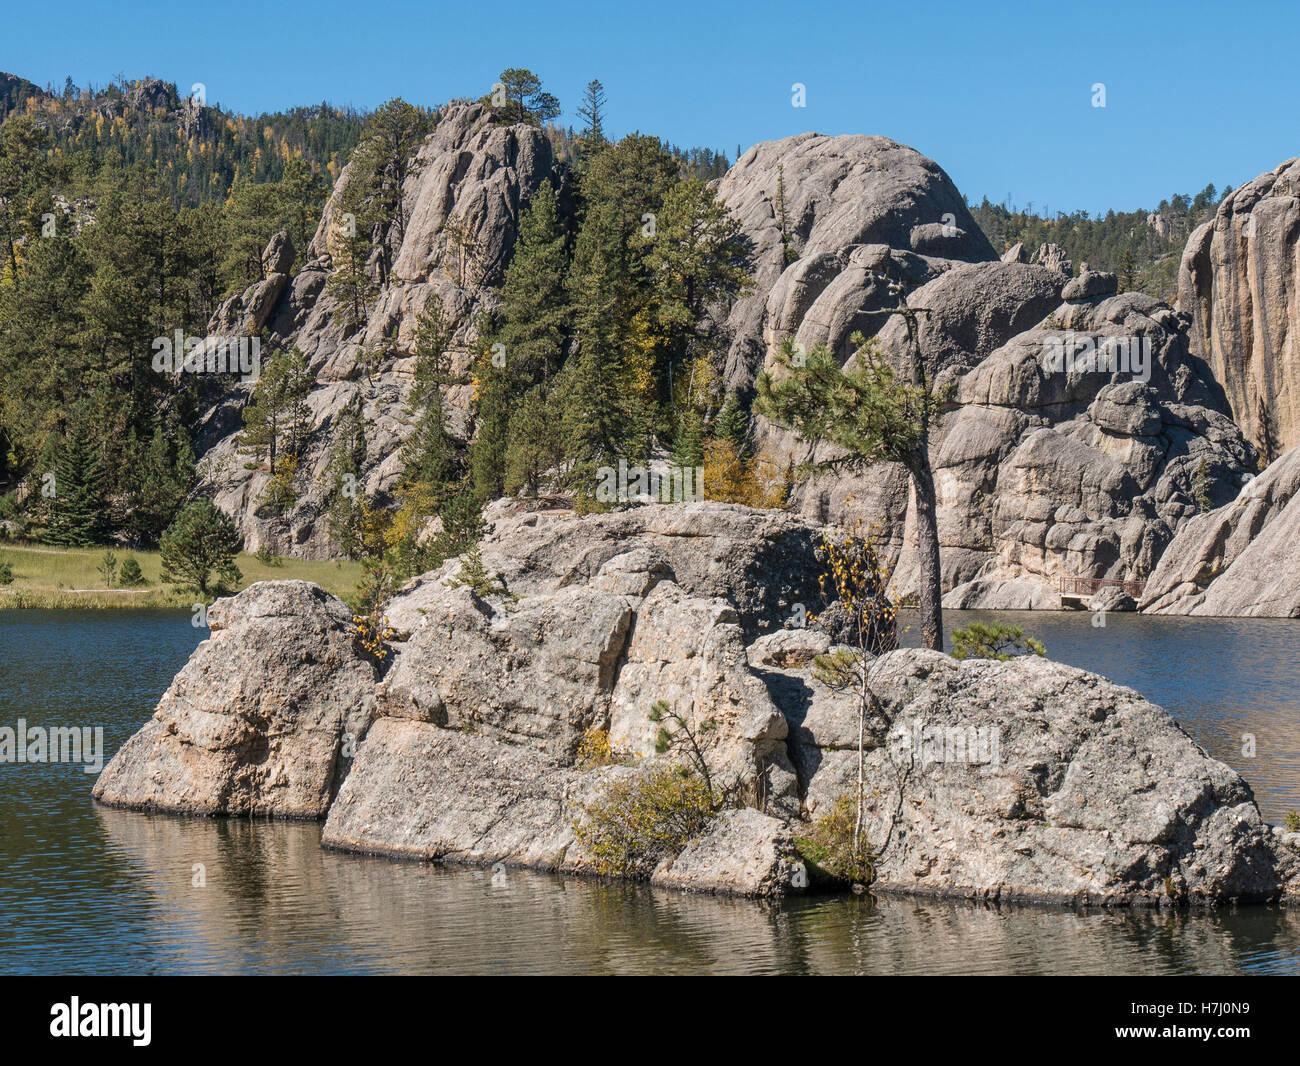 Rock island, Sylvan Lake, Needles Highway, Custer State Park, South Dakota. Stock Photo